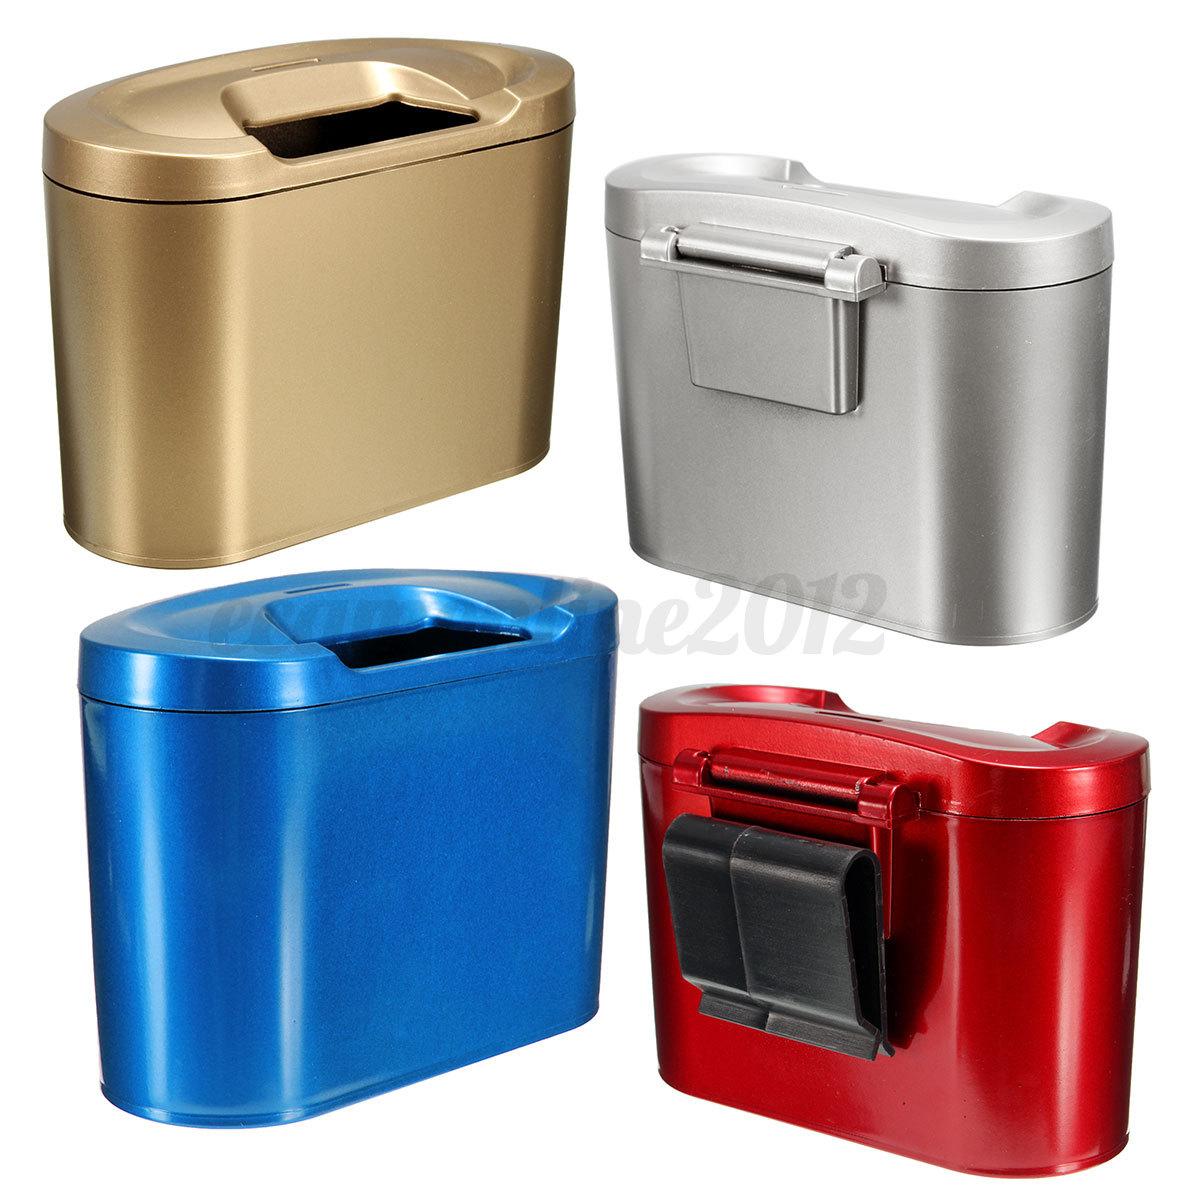 car trash can bin garbage storage box multifunction vehicle container dustbin ca ebay. Black Bedroom Furniture Sets. Home Design Ideas